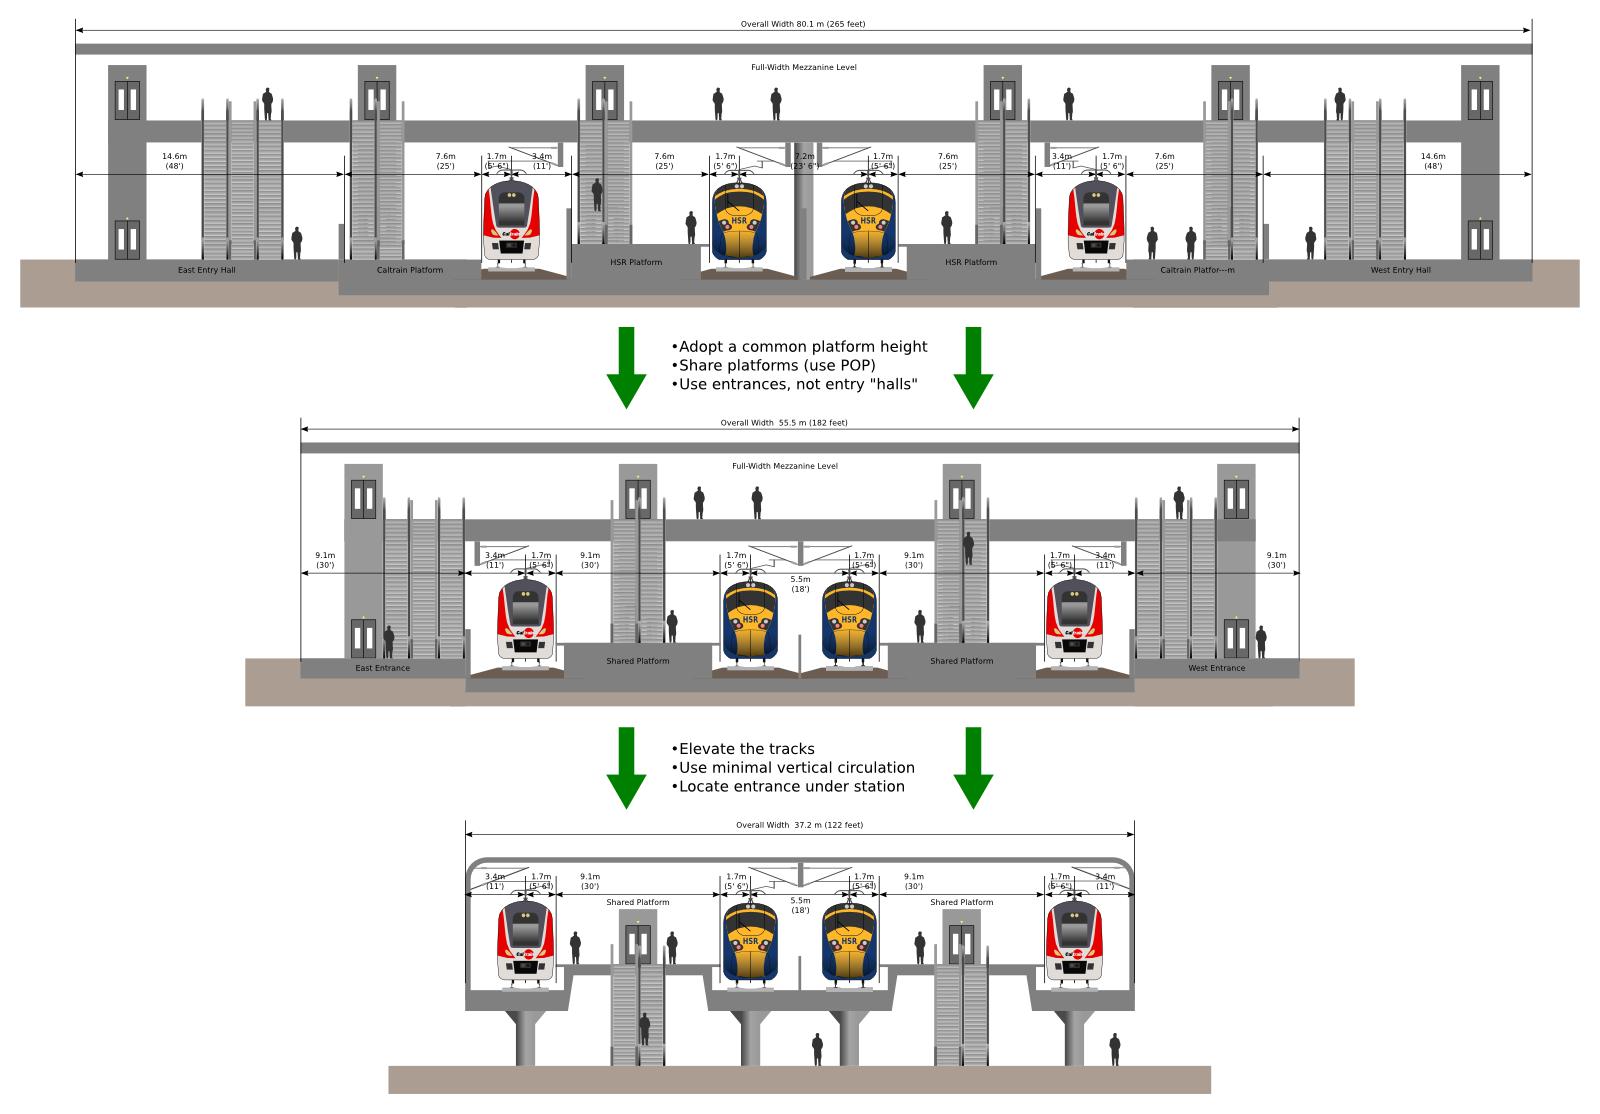 Caltrain HSR Compatibility Blog: Station Design 101